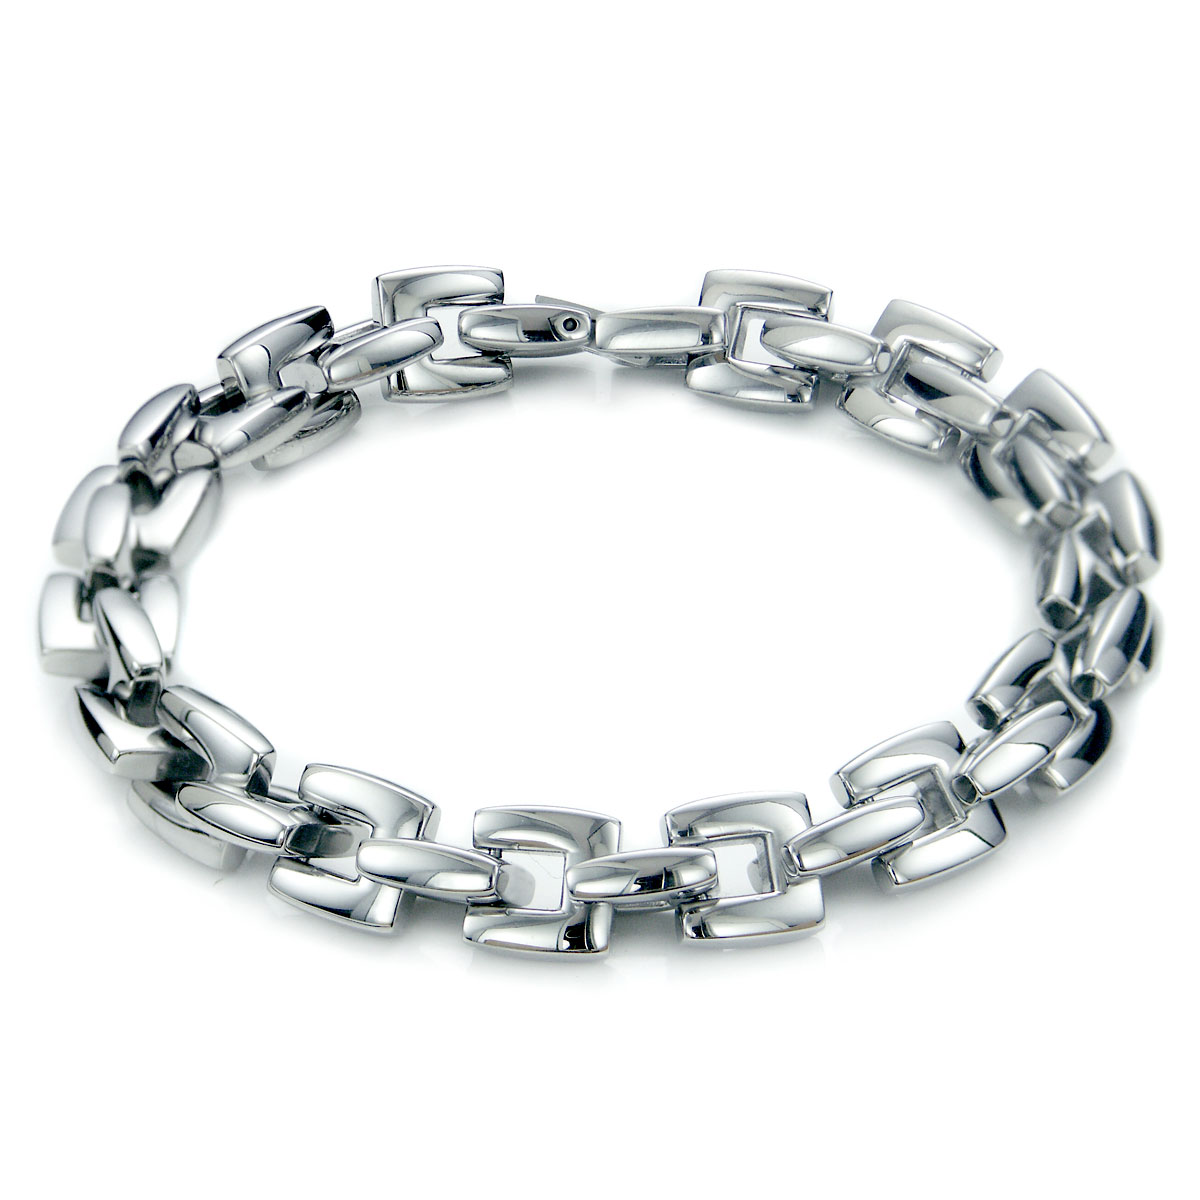 Stainless Steel Men's Large Box Link Bracelet